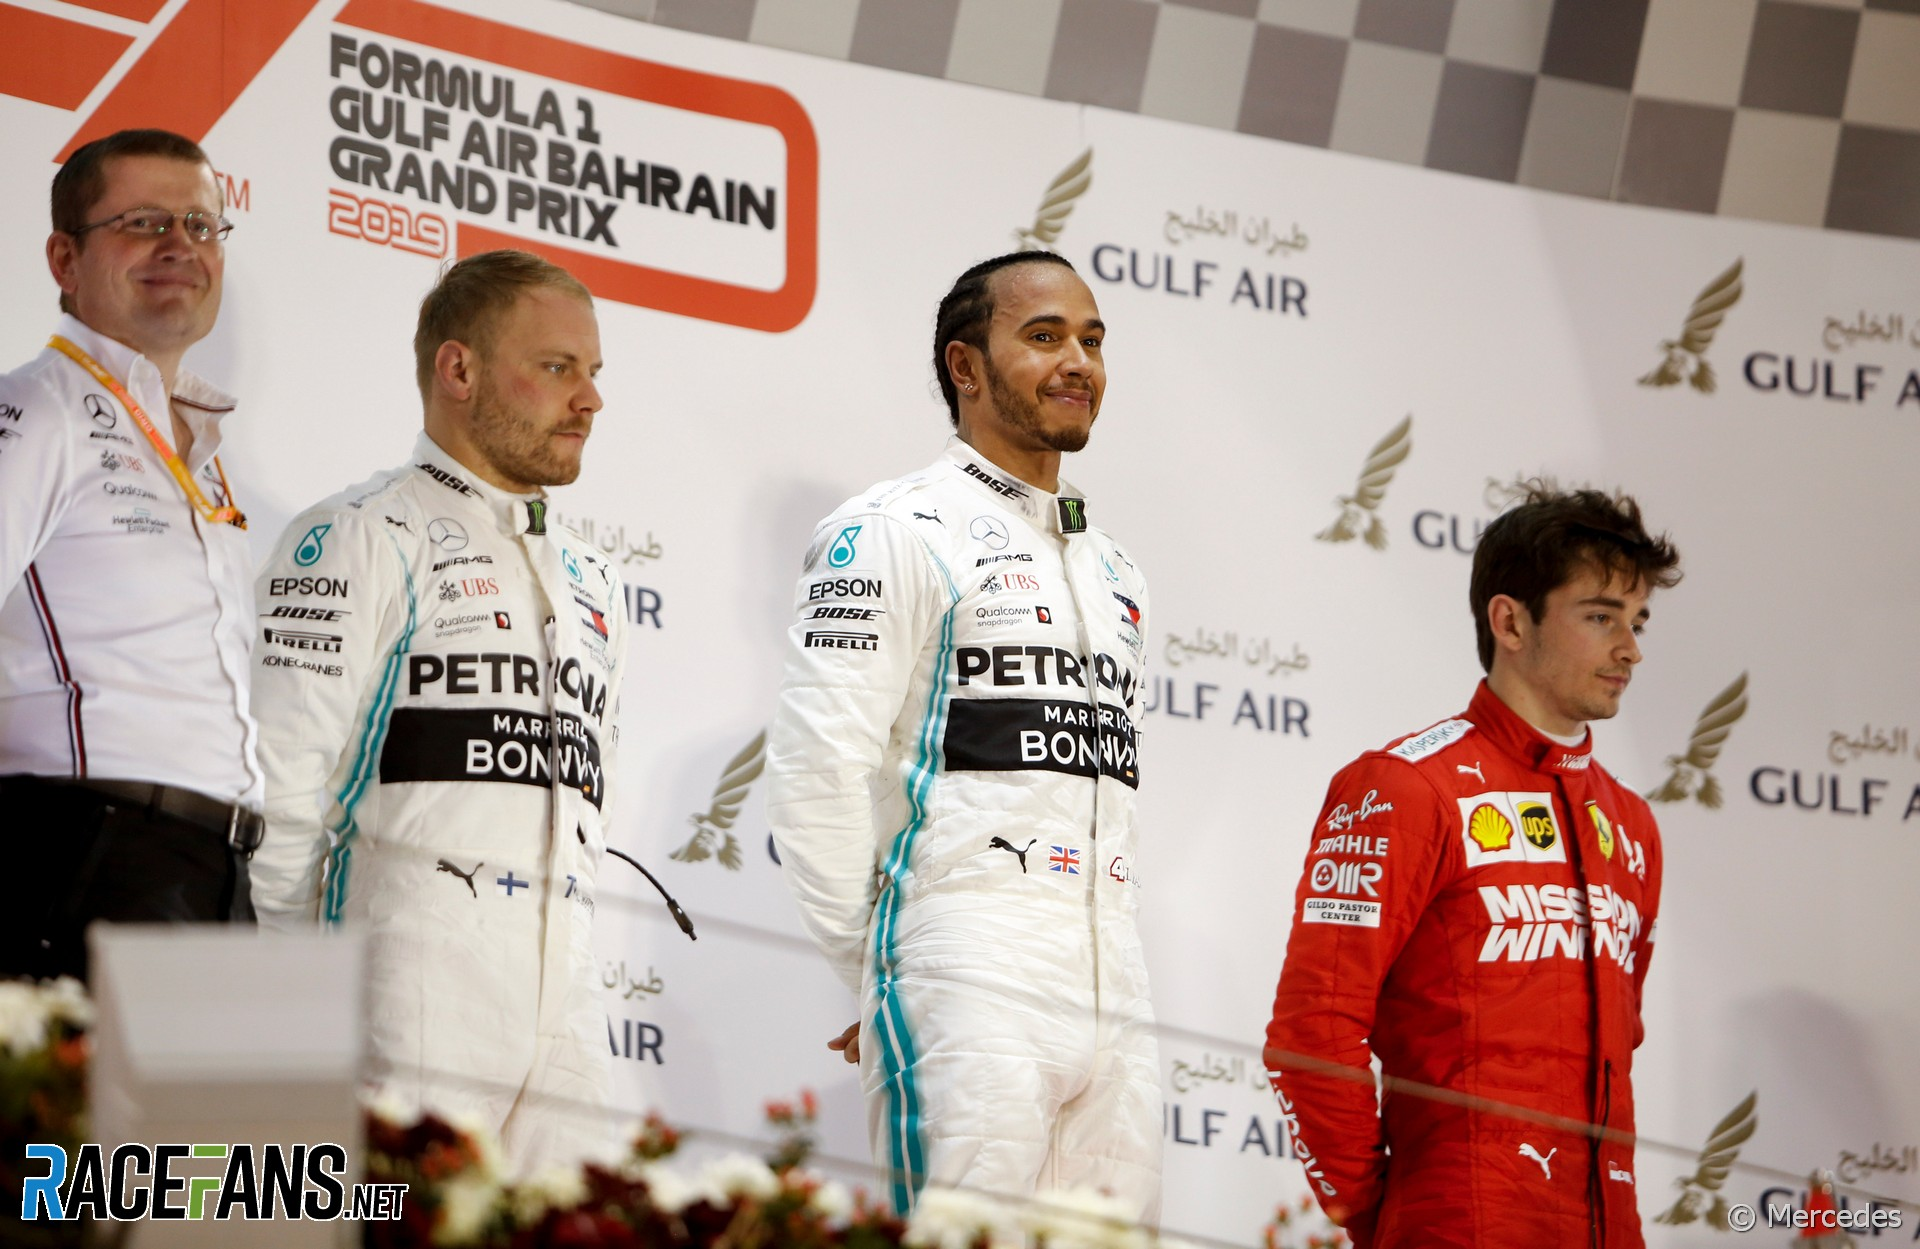 Valtteri Bottas, Lewis Hamilton, Charles Leclerc, Bahrain International Circuit, 2019